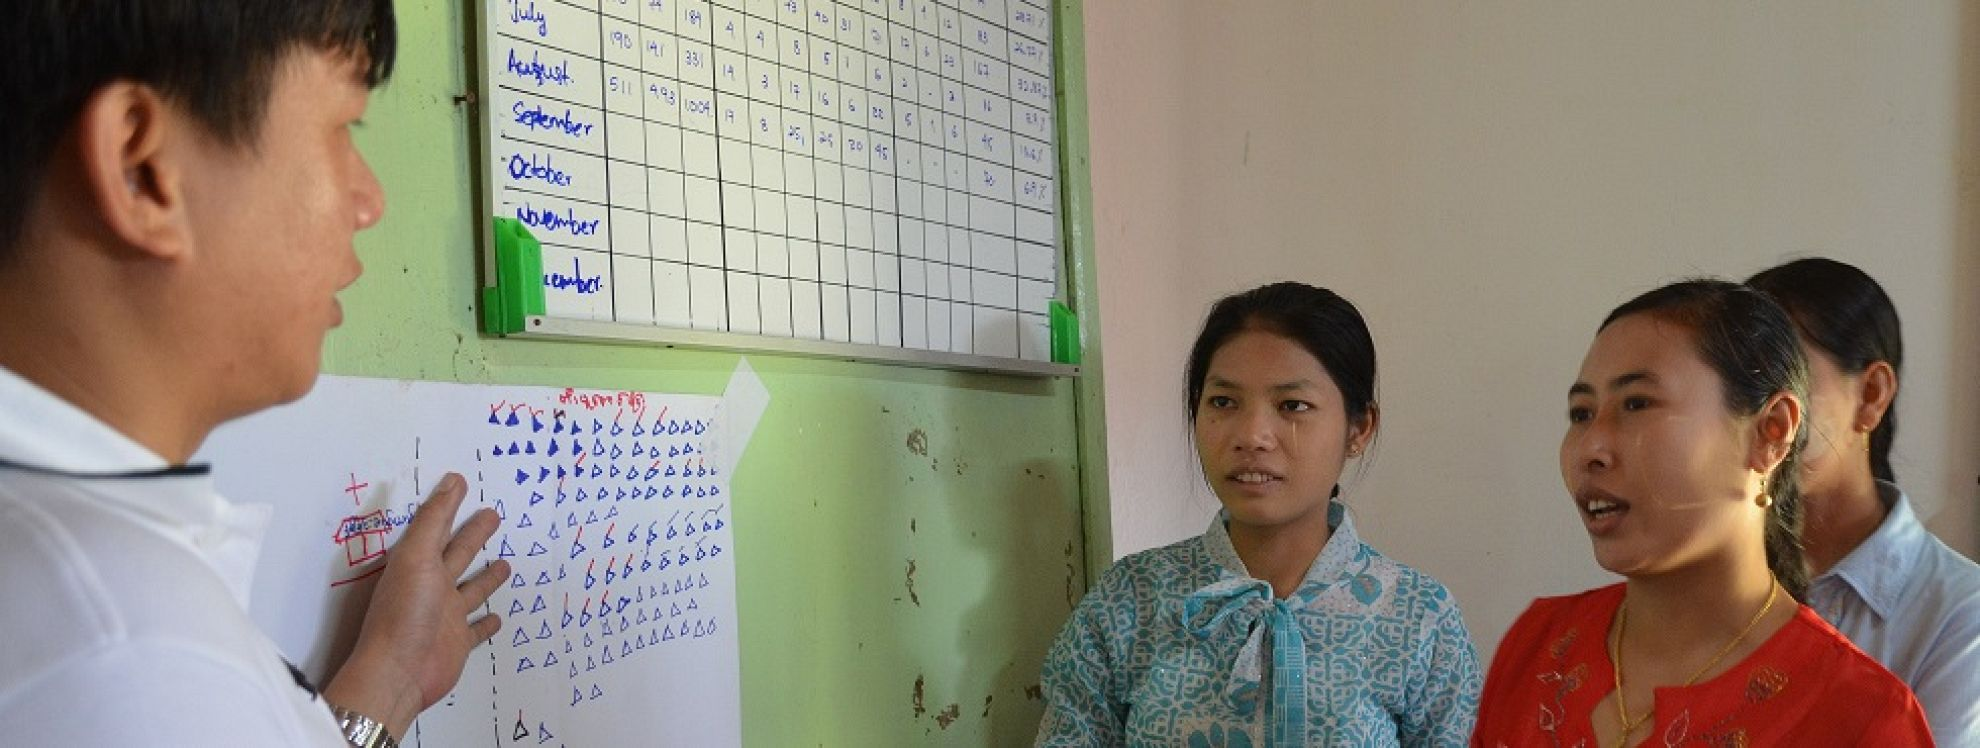 Latest News Malaria consortium conducting myanmar s first malaria indicator survey